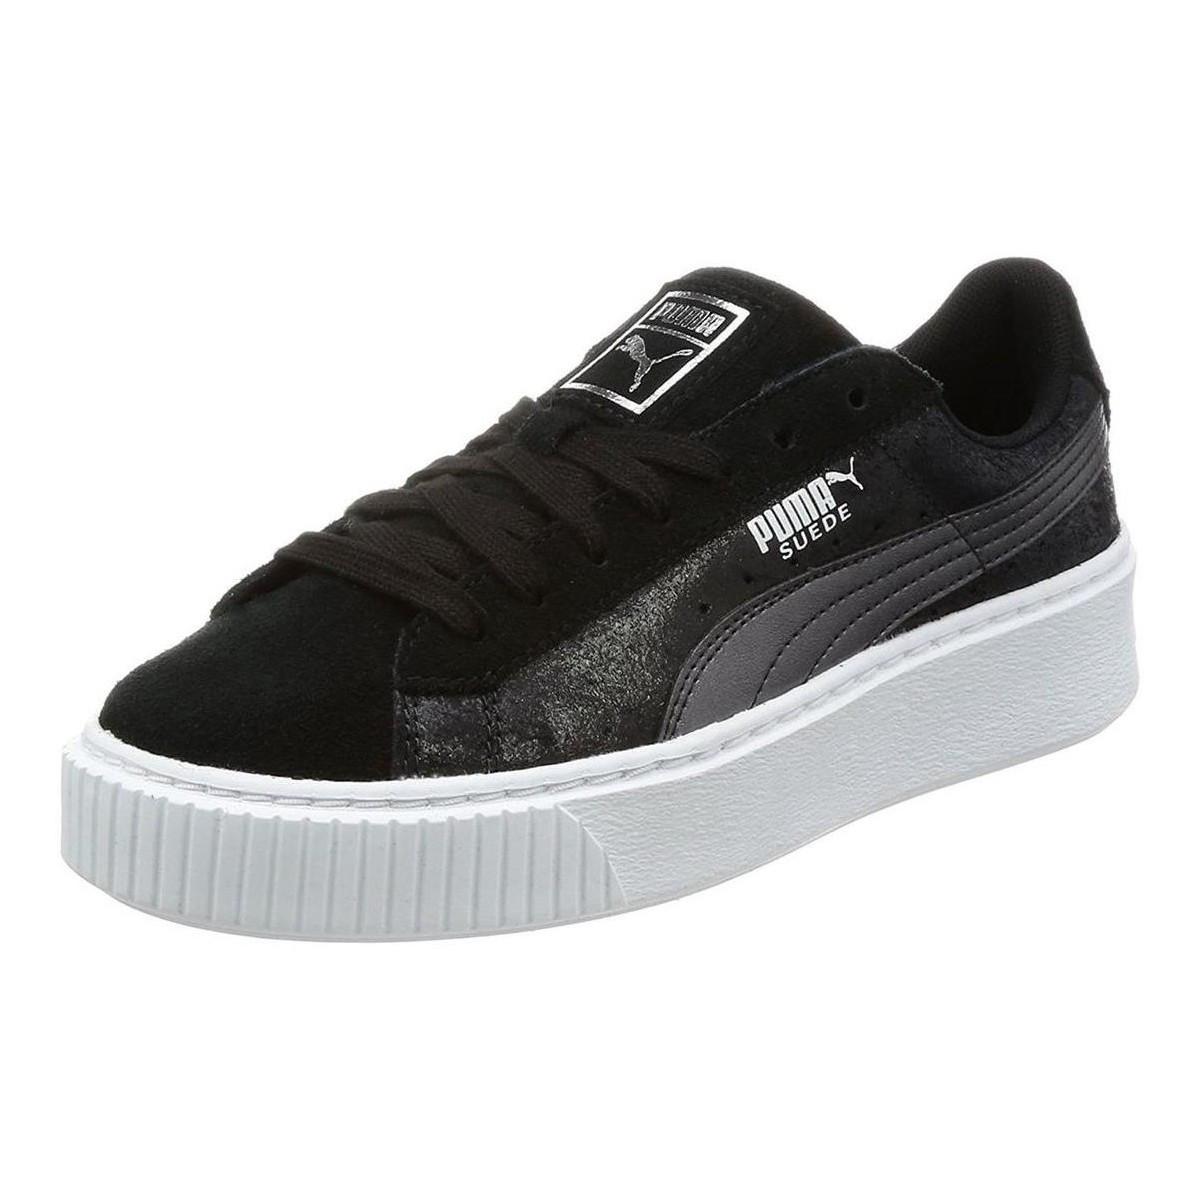 chaussure femme puma pas cher